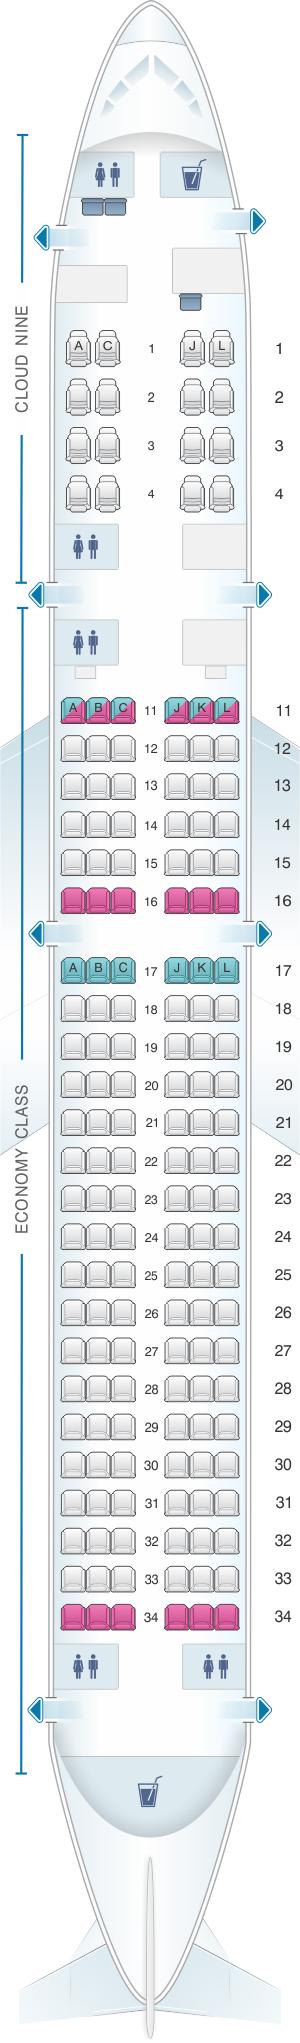 Seat map for Ethiopian Boeing B757 200 ER 160pax